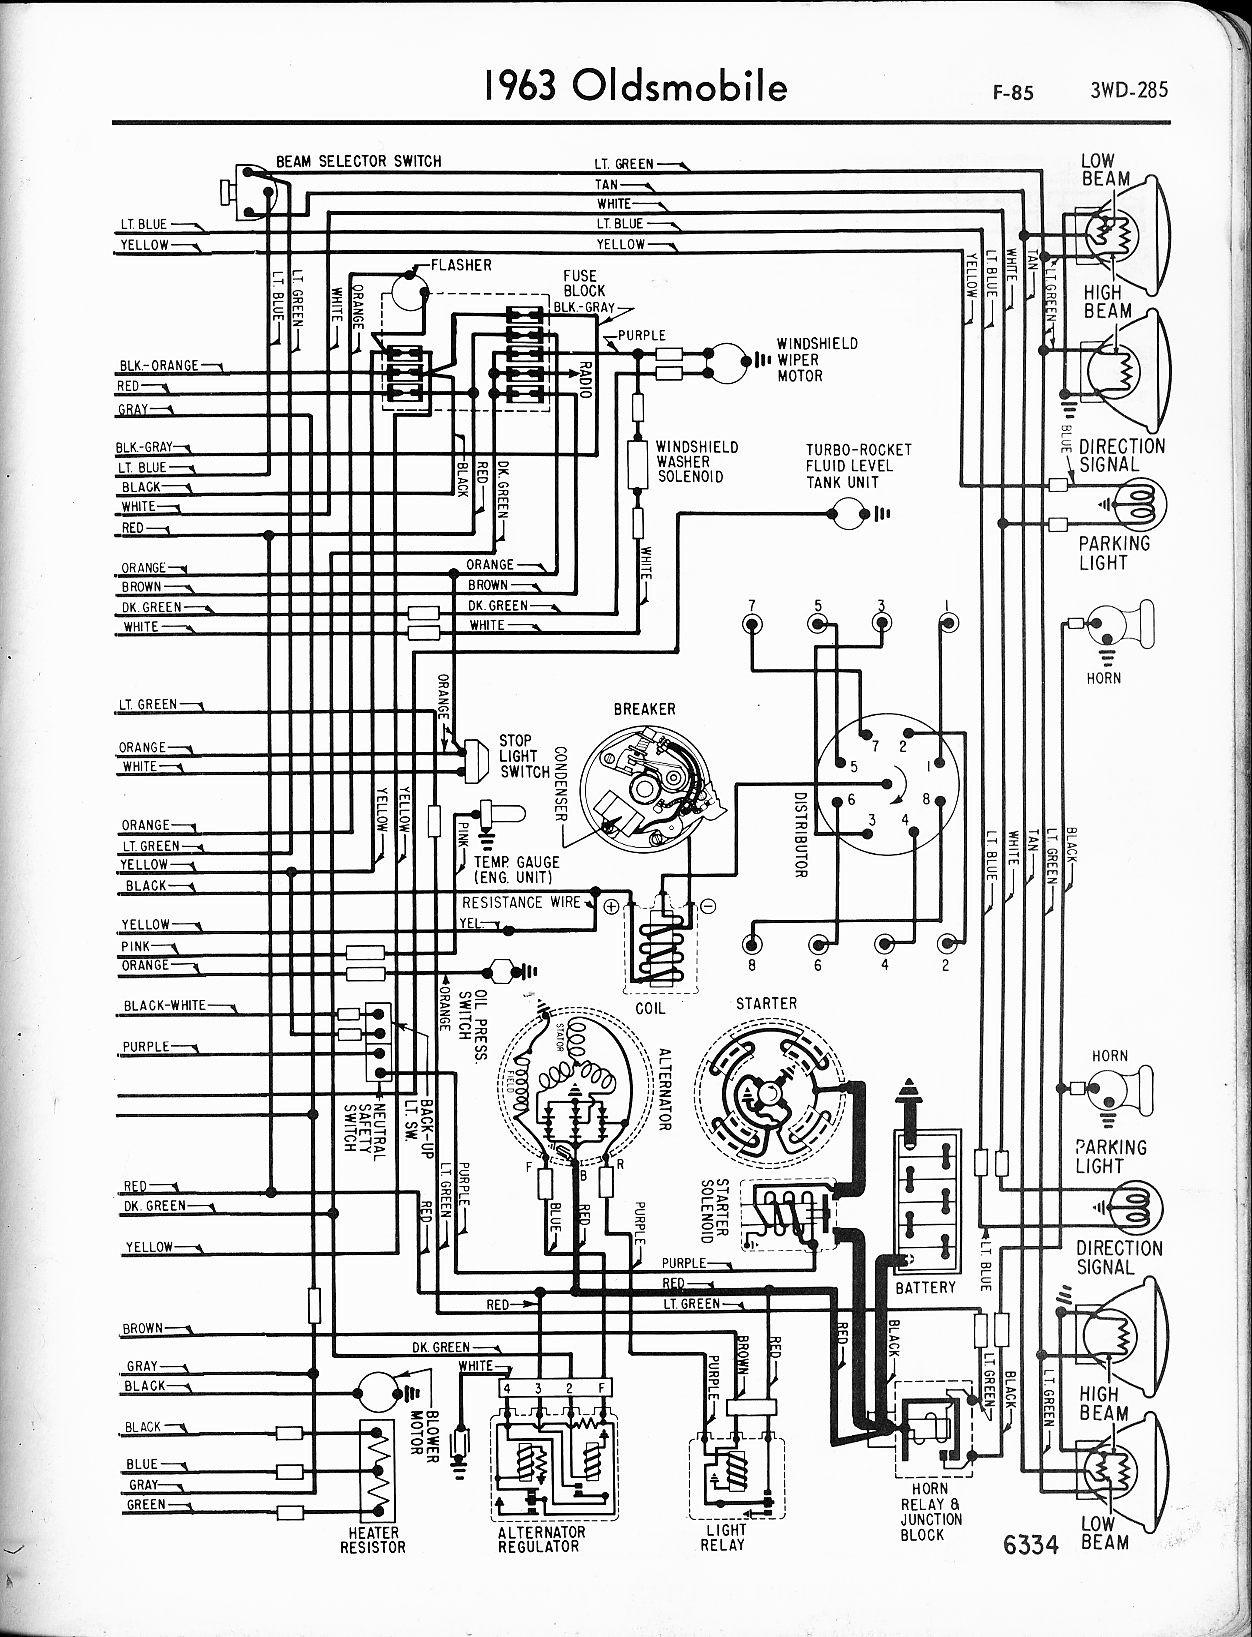 1972 cutlass wiring diagram